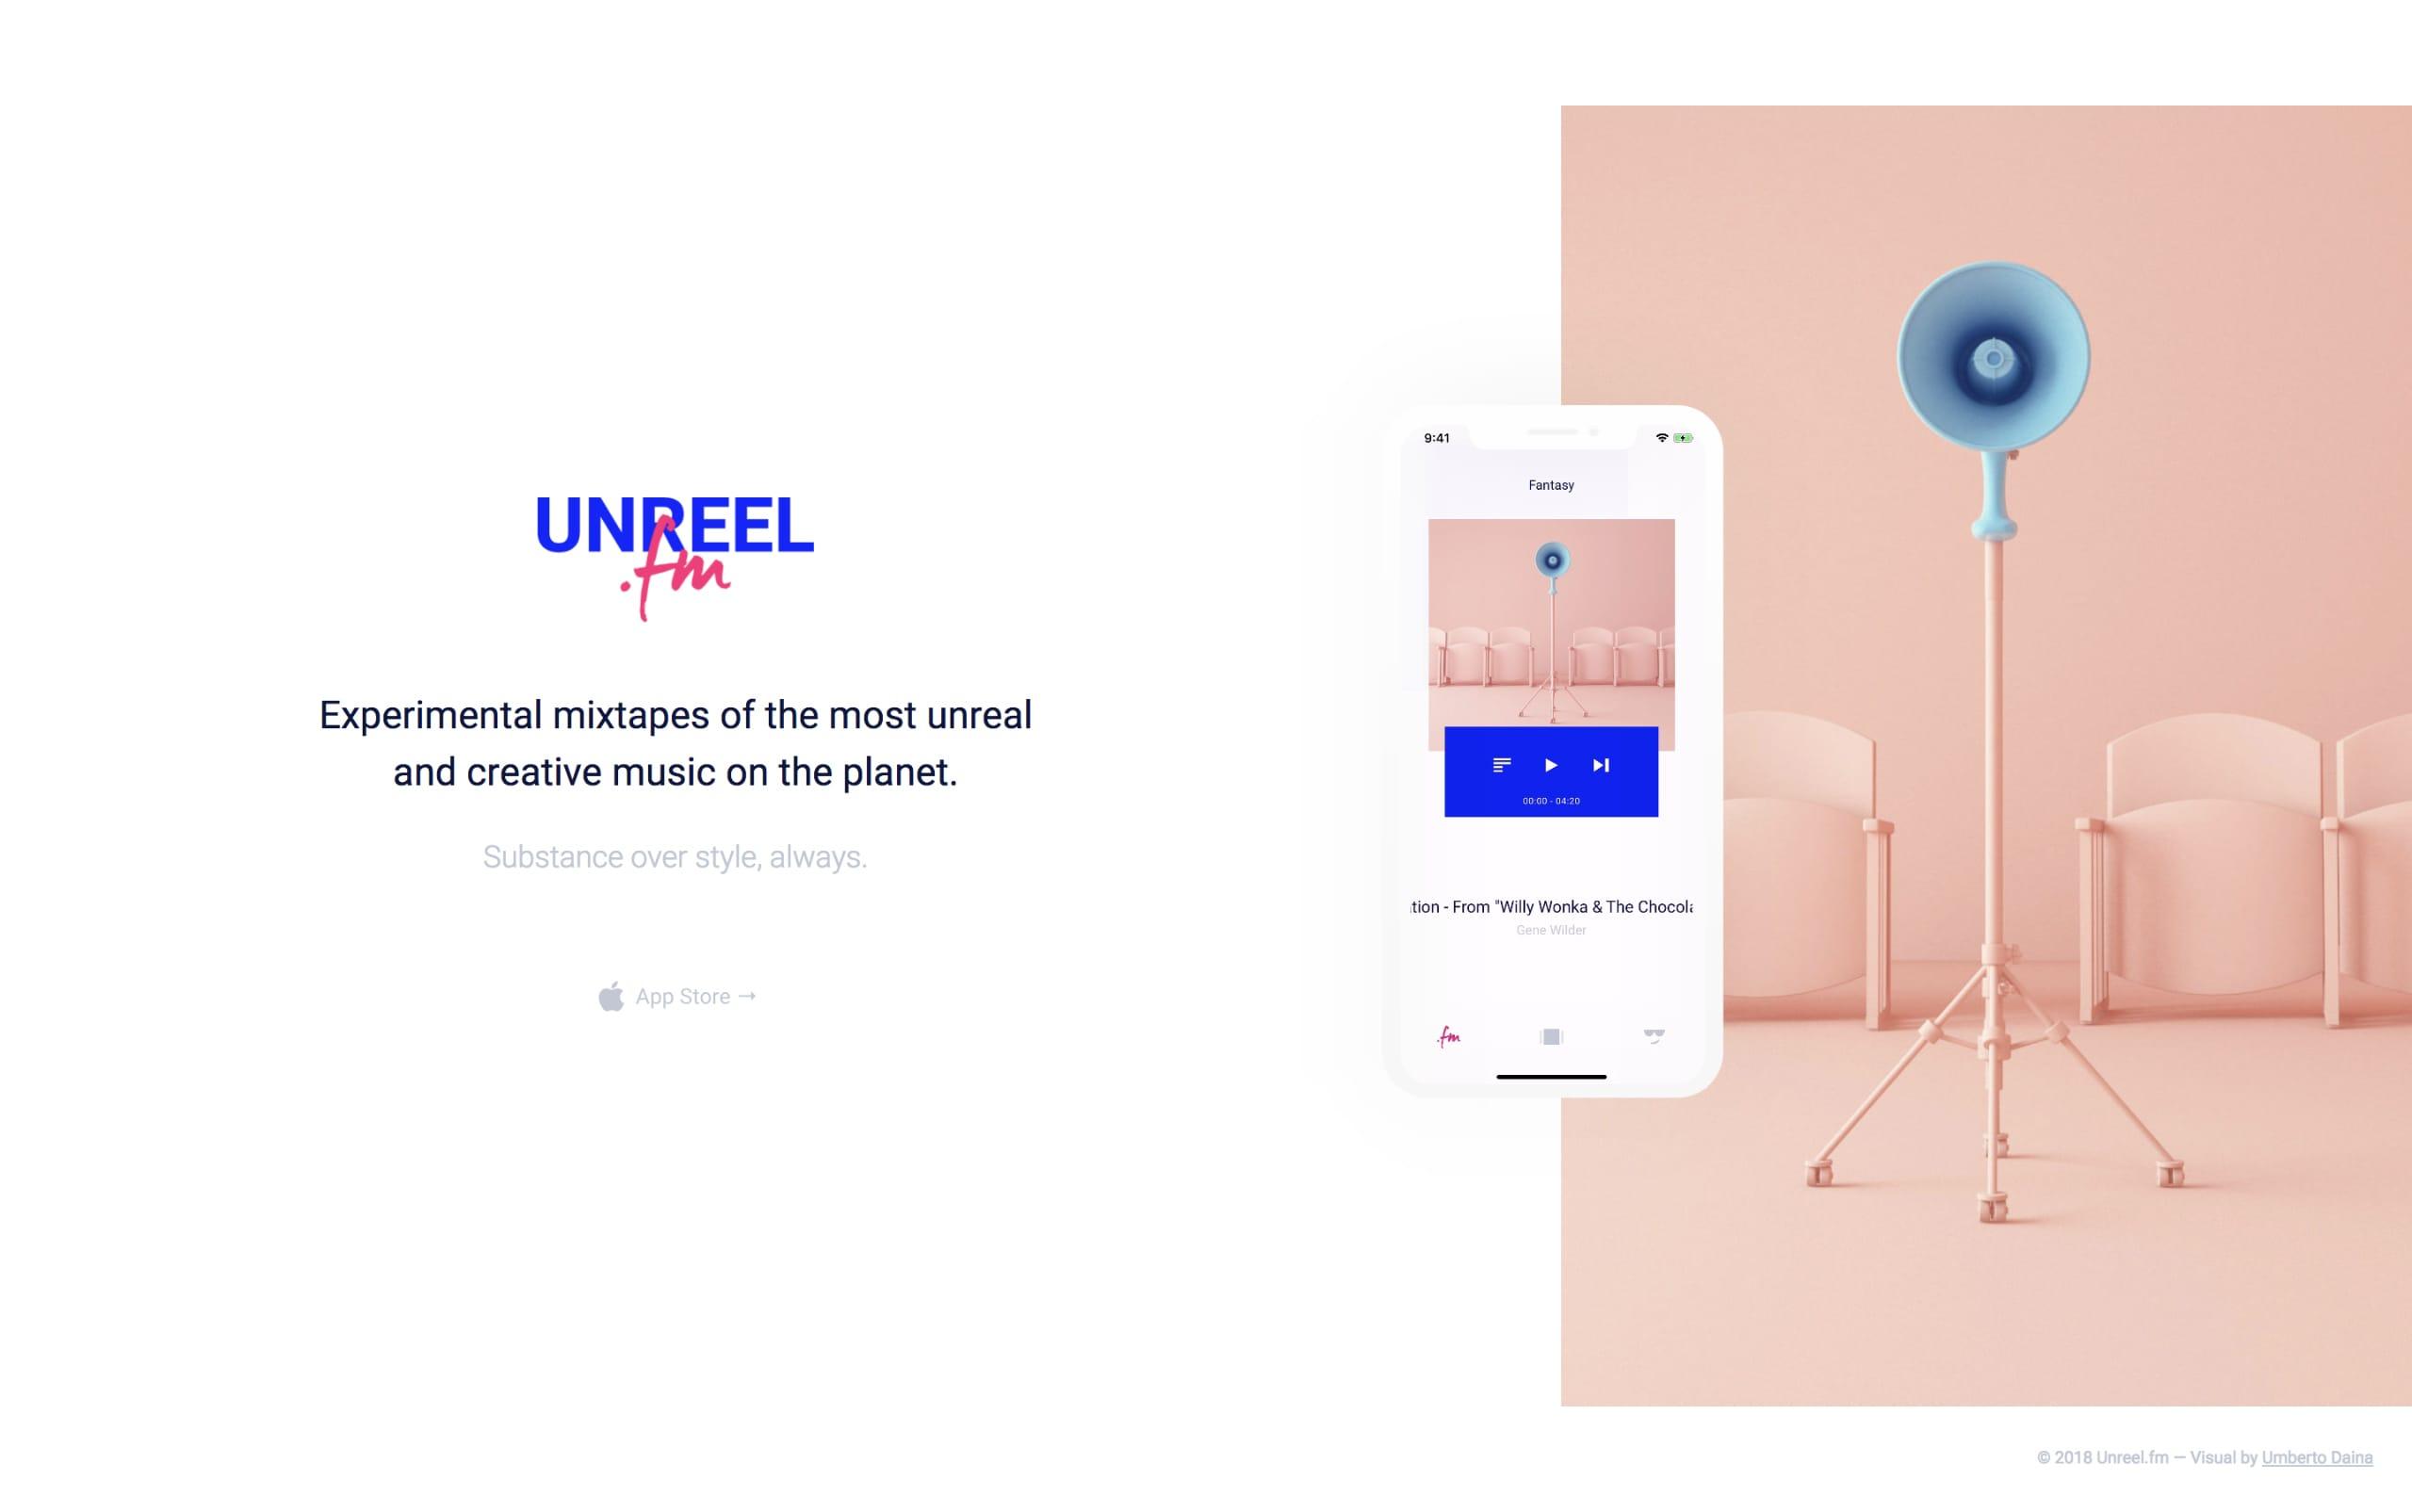 Unreel.fm Website Screenshot